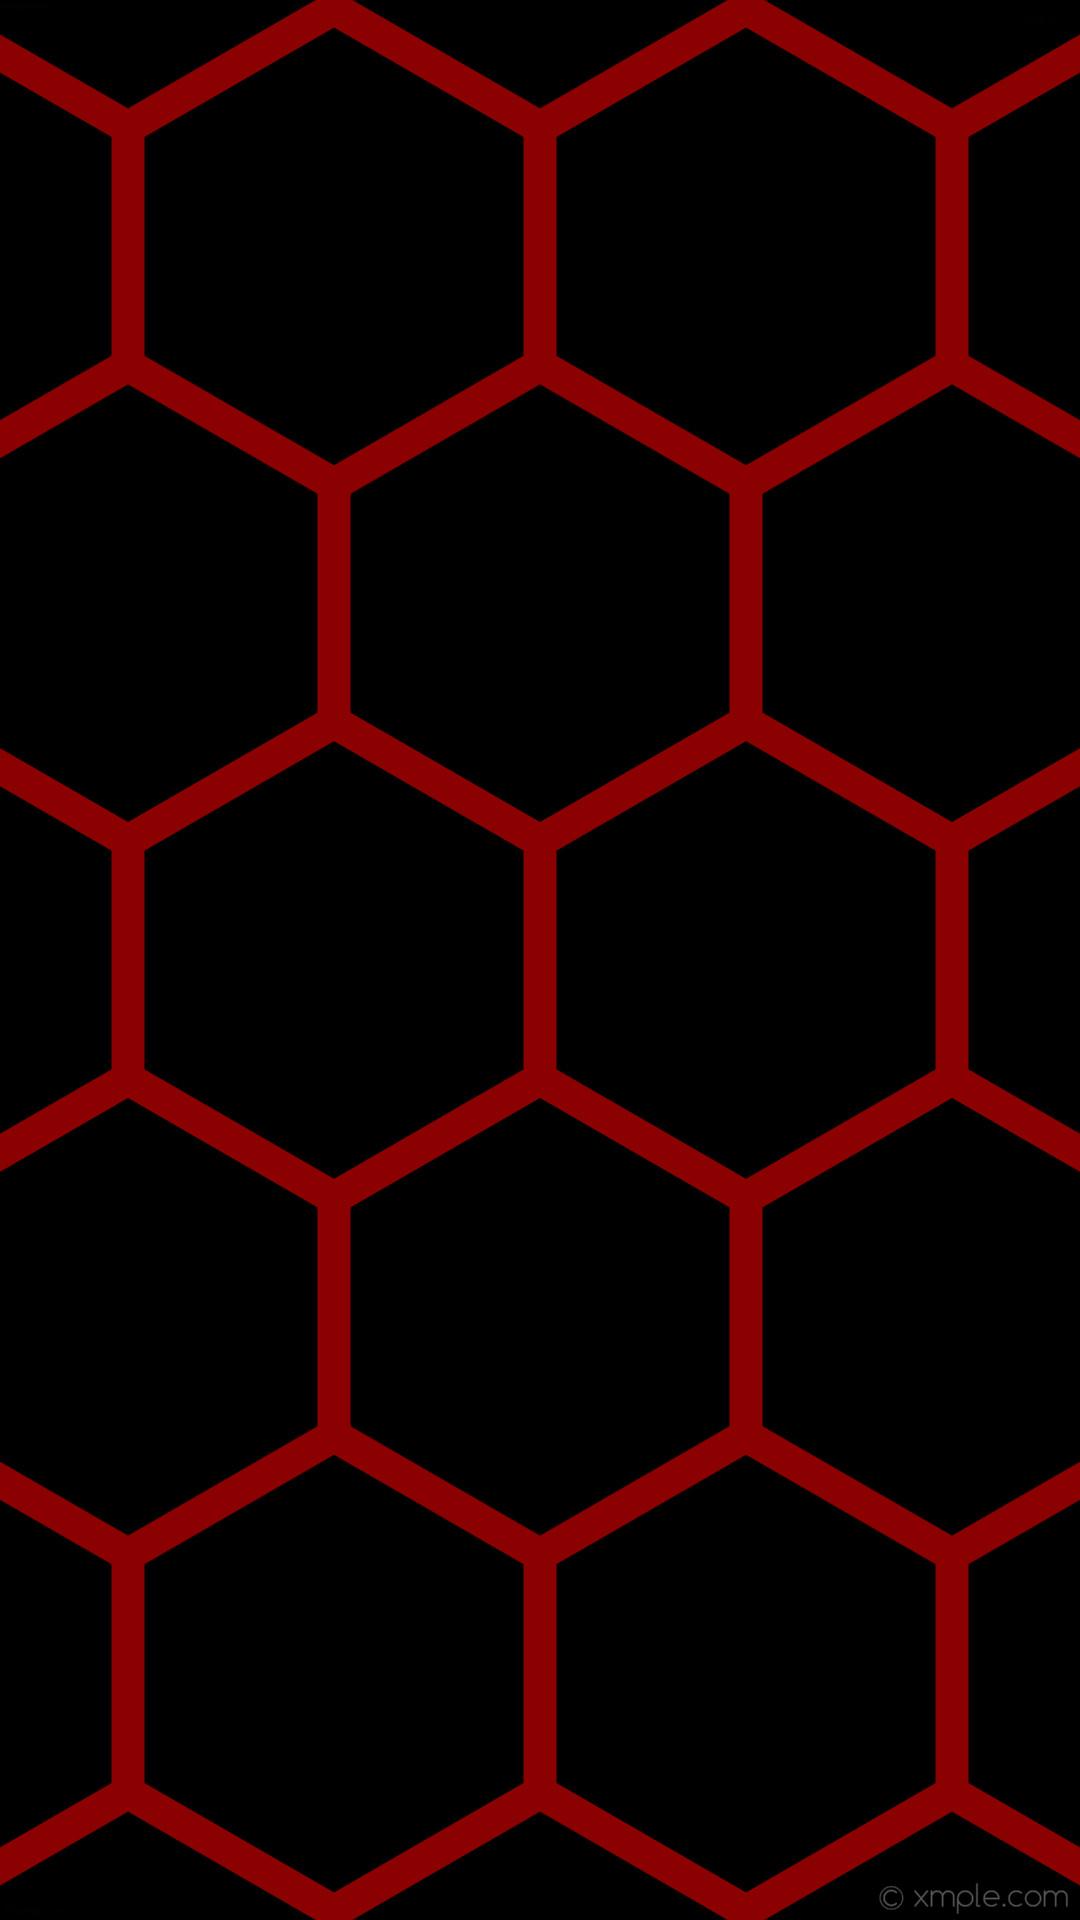 wallpaper red honeycomb black hexagon beehive dark red #000000 #8b0000 0°  33px 412px